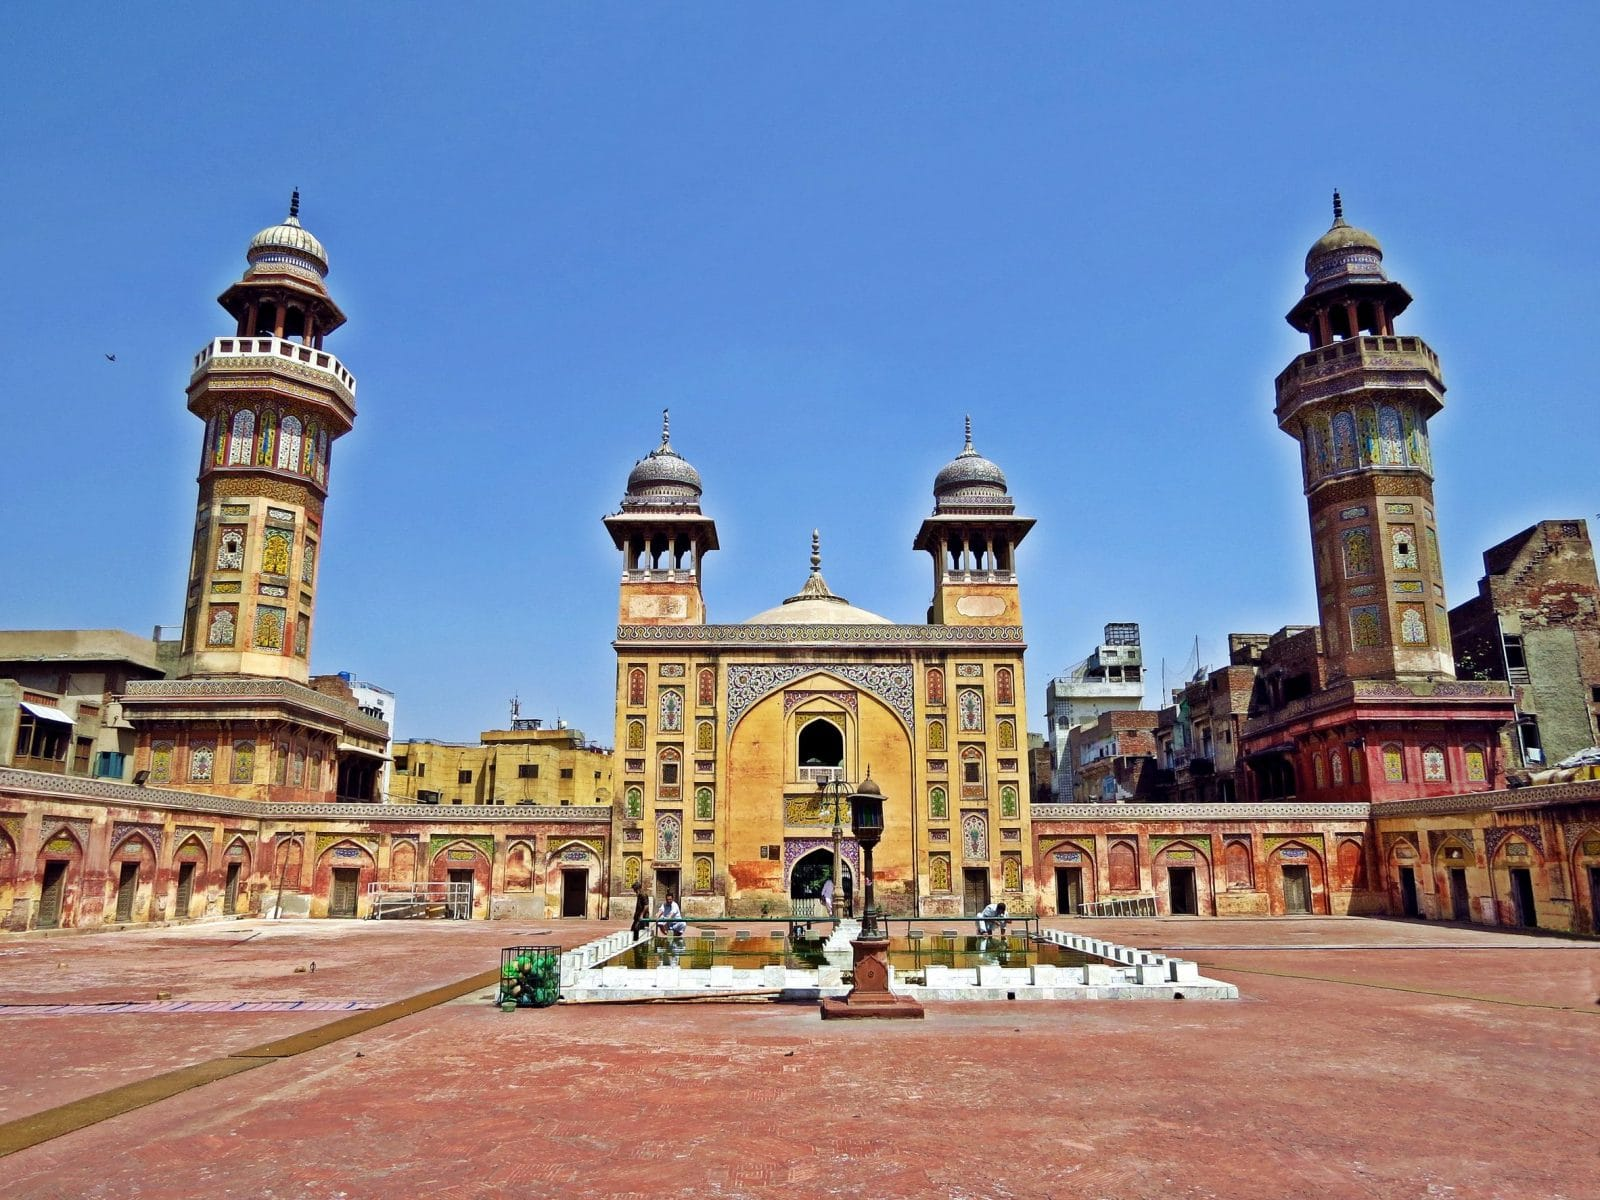 UNESCO Patrimonio Mundial da Humanidade no Paquistao